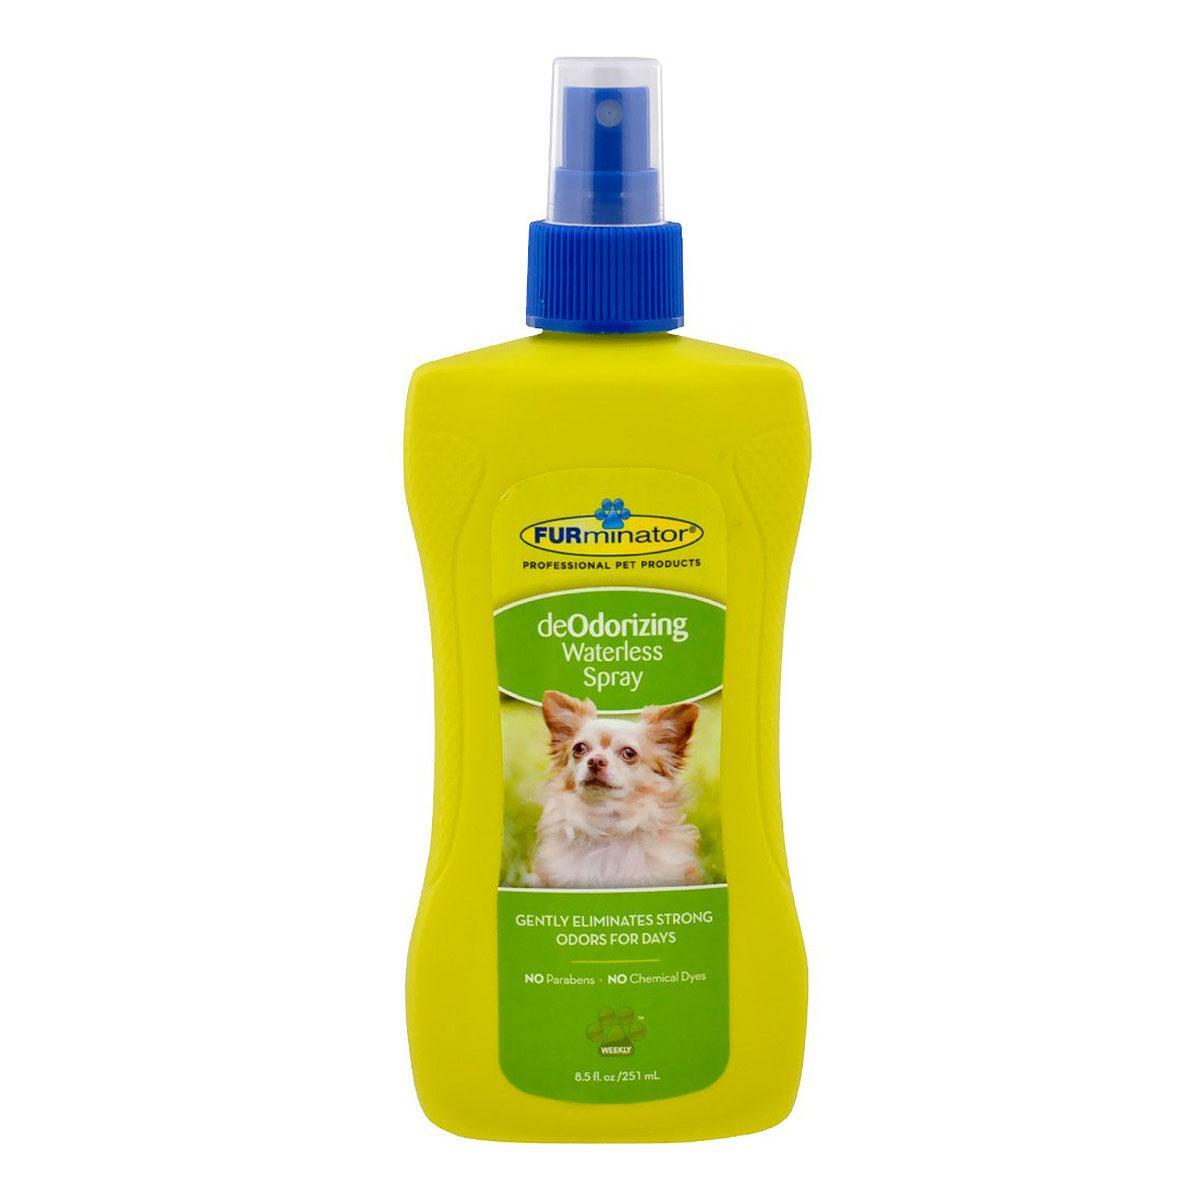 DeOdorizing Waterless Pet Spray by FURminator